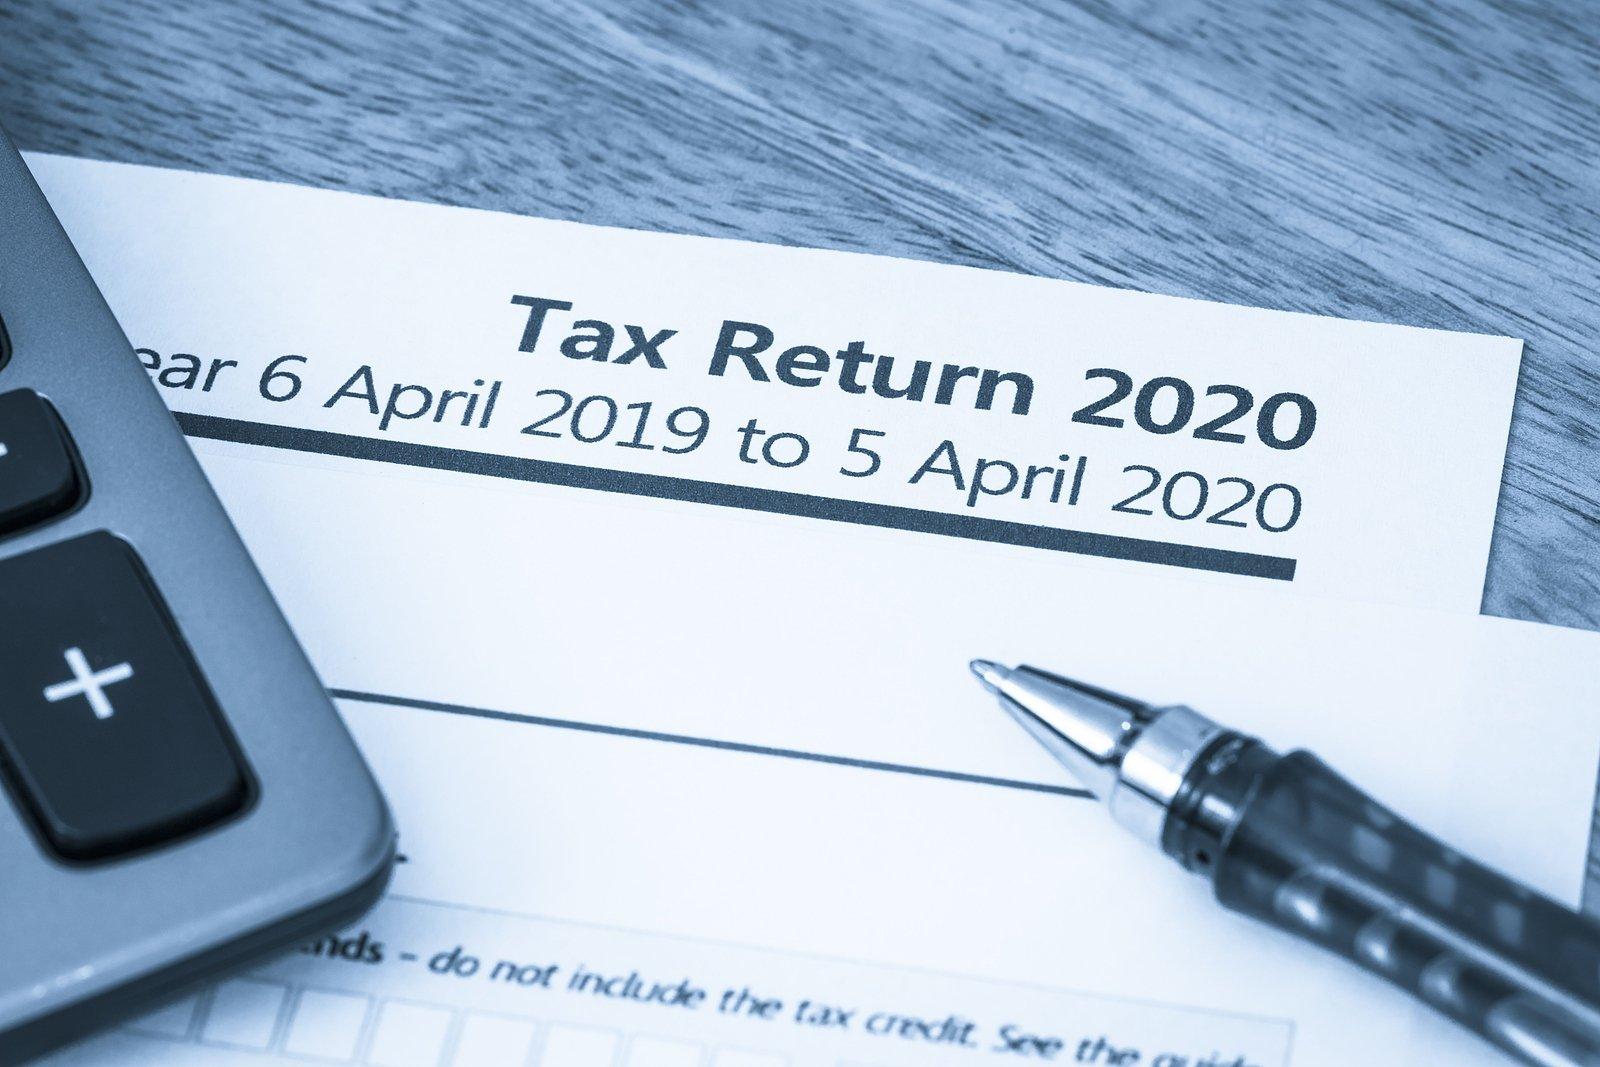 myrick-cpa-dc-says-start-2020-tax-prep